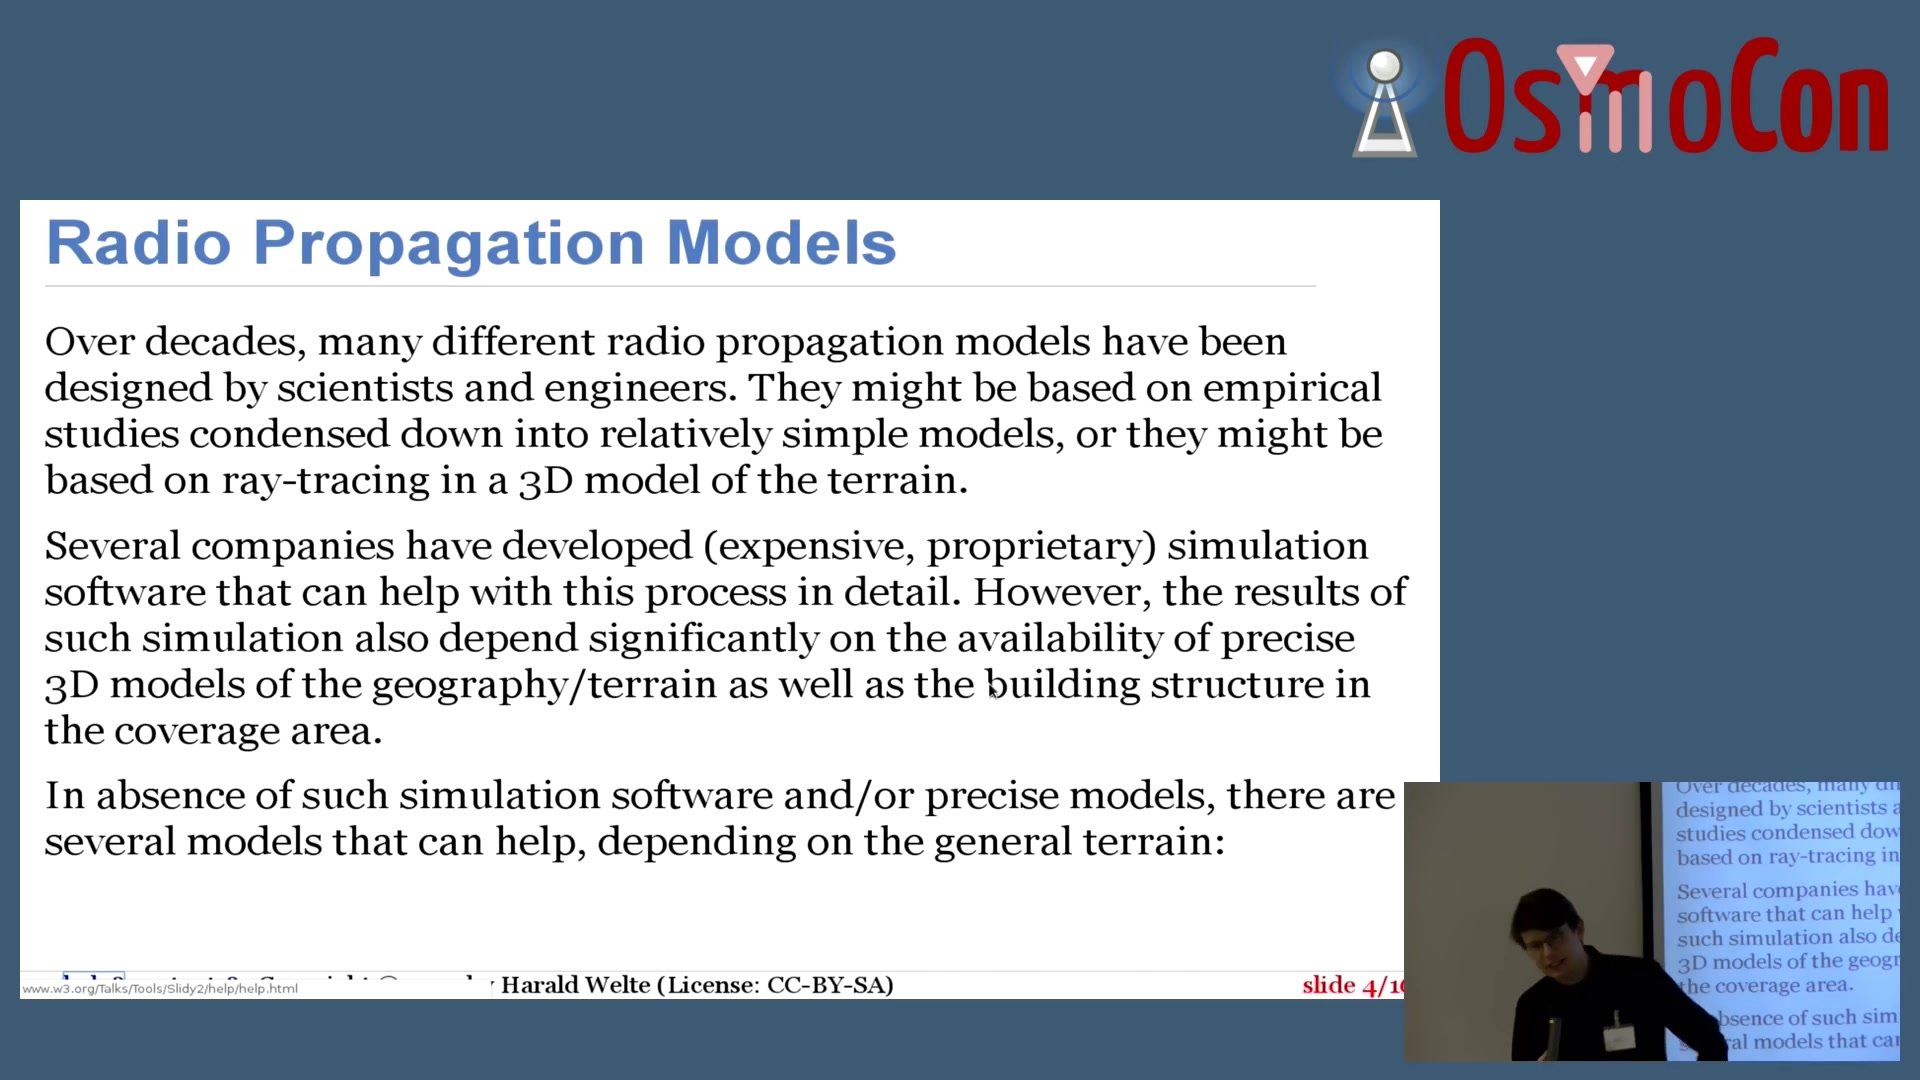 media ccc de - Fundamental GSM radio frequency planning